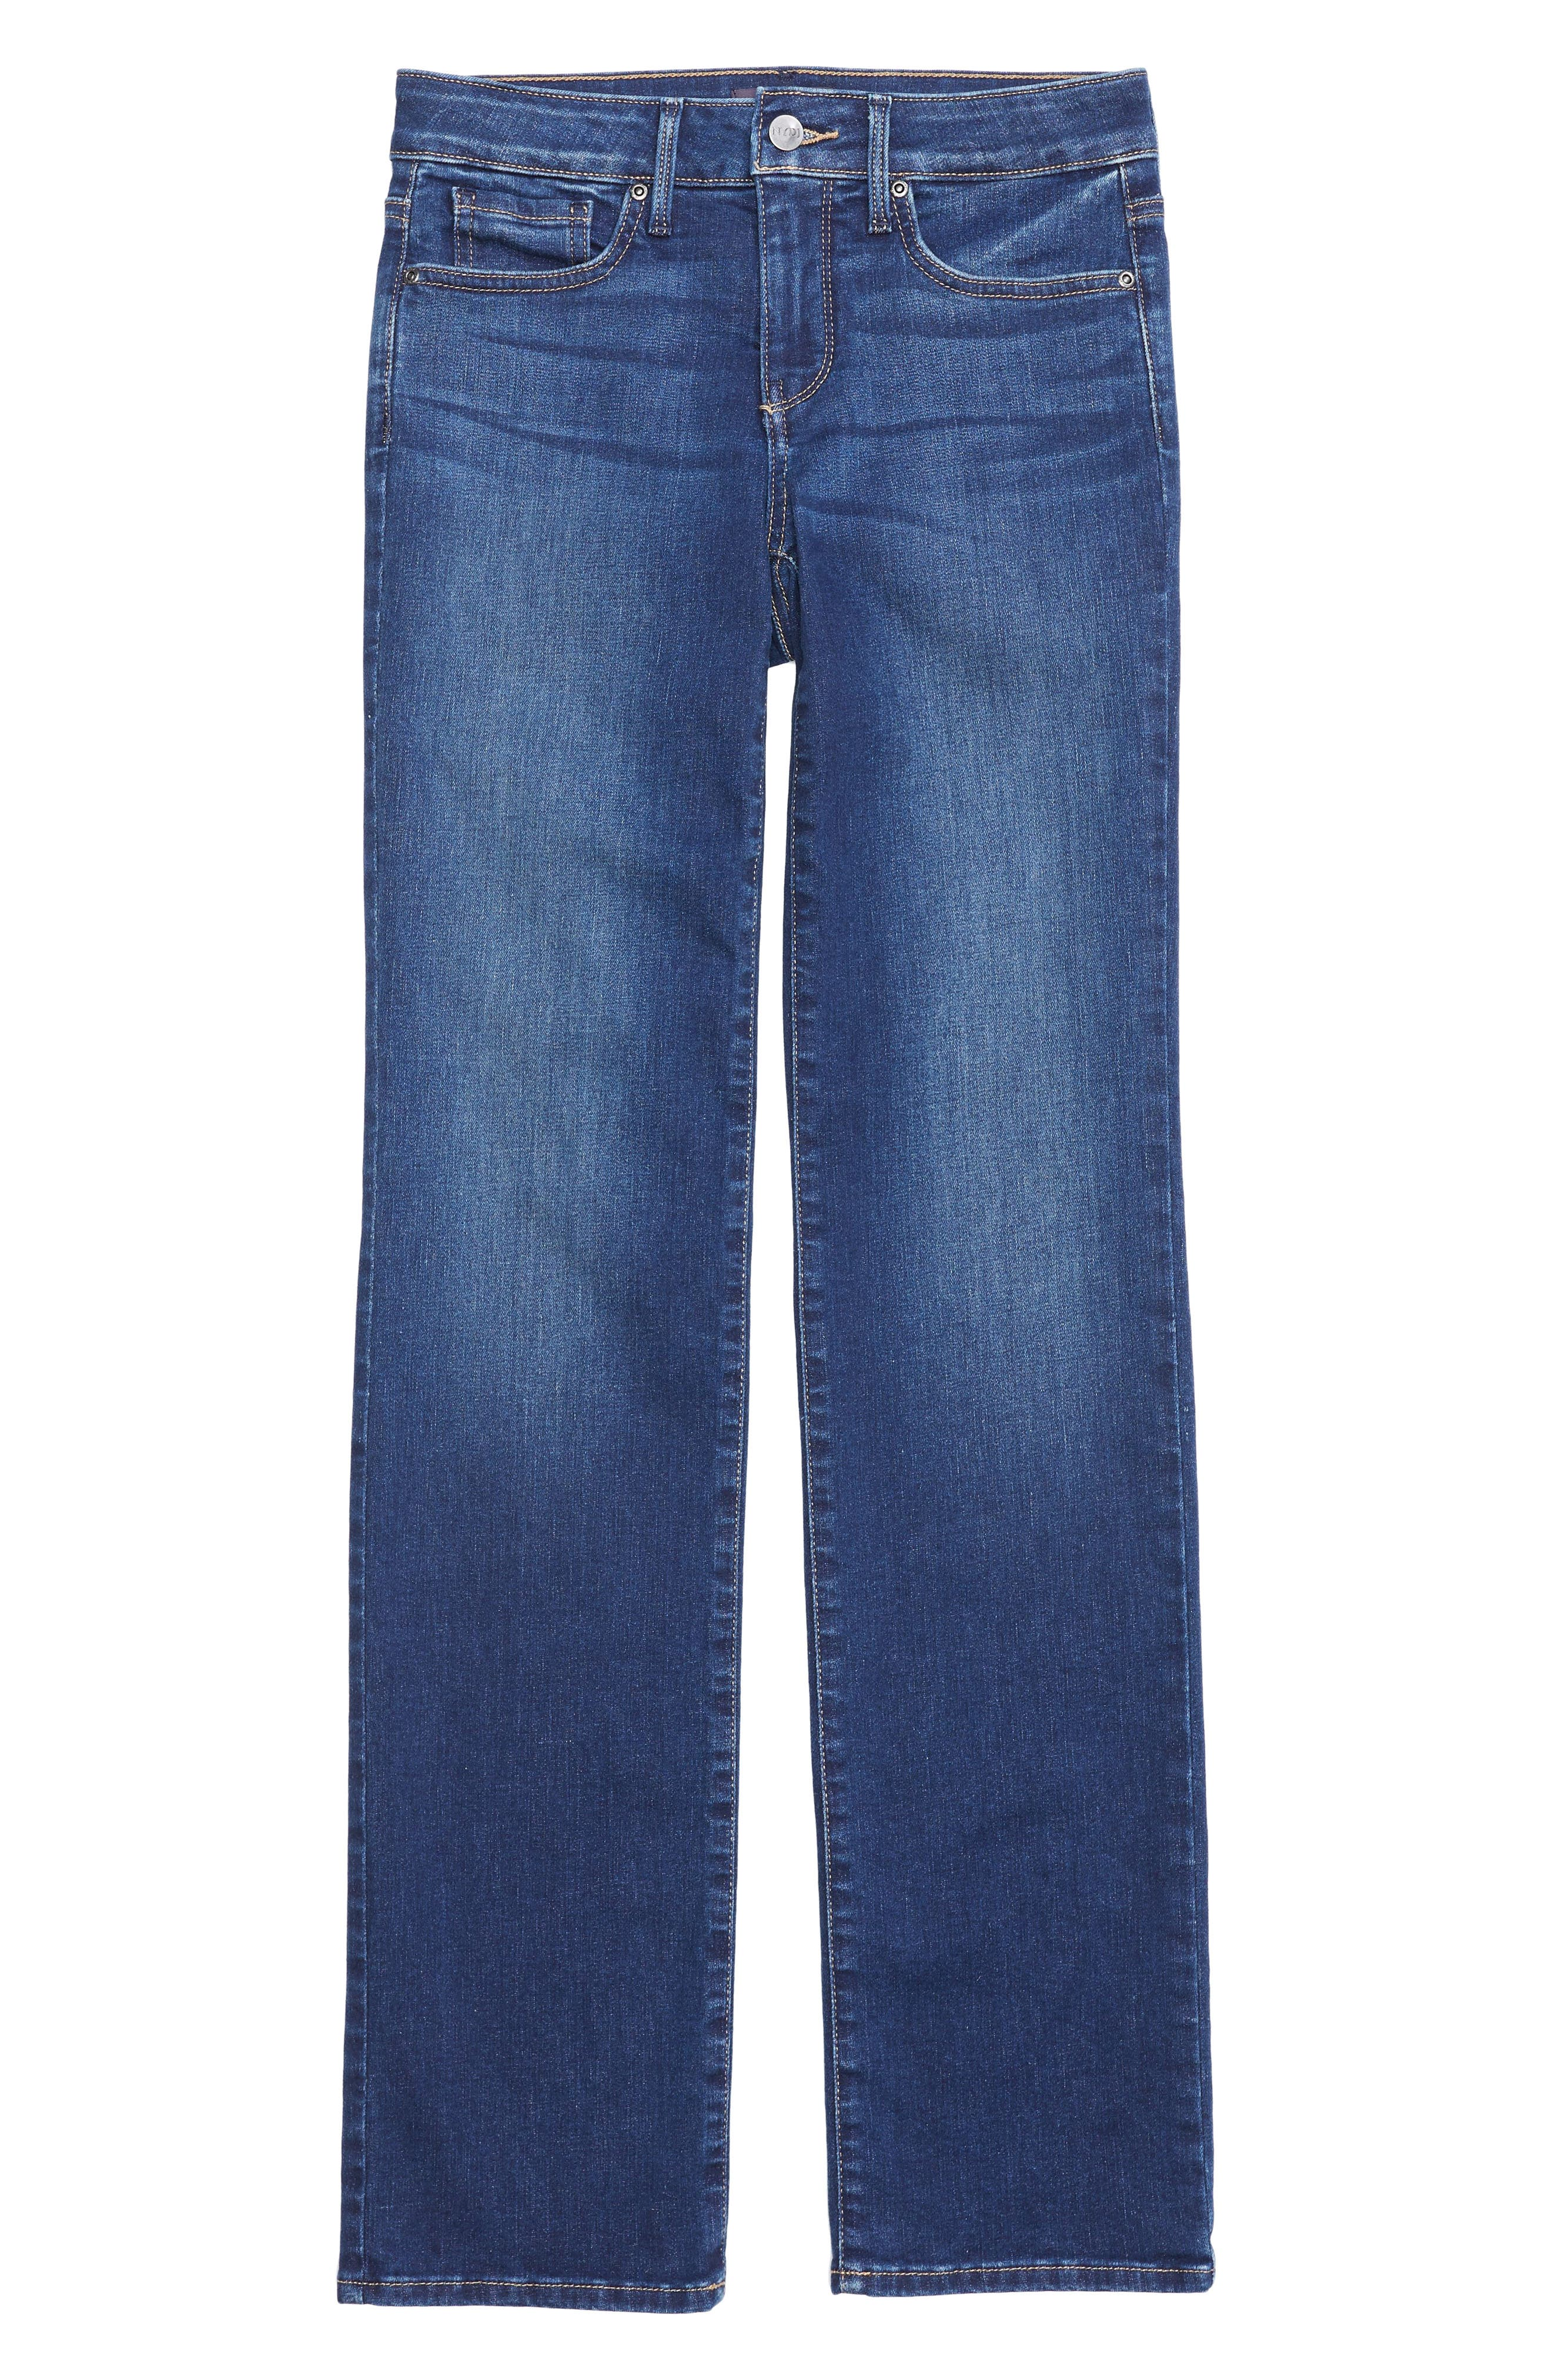 NYDJ, Marilyn Stretch Straight Leg Jeans, Alternate thumbnail 5, color, 405